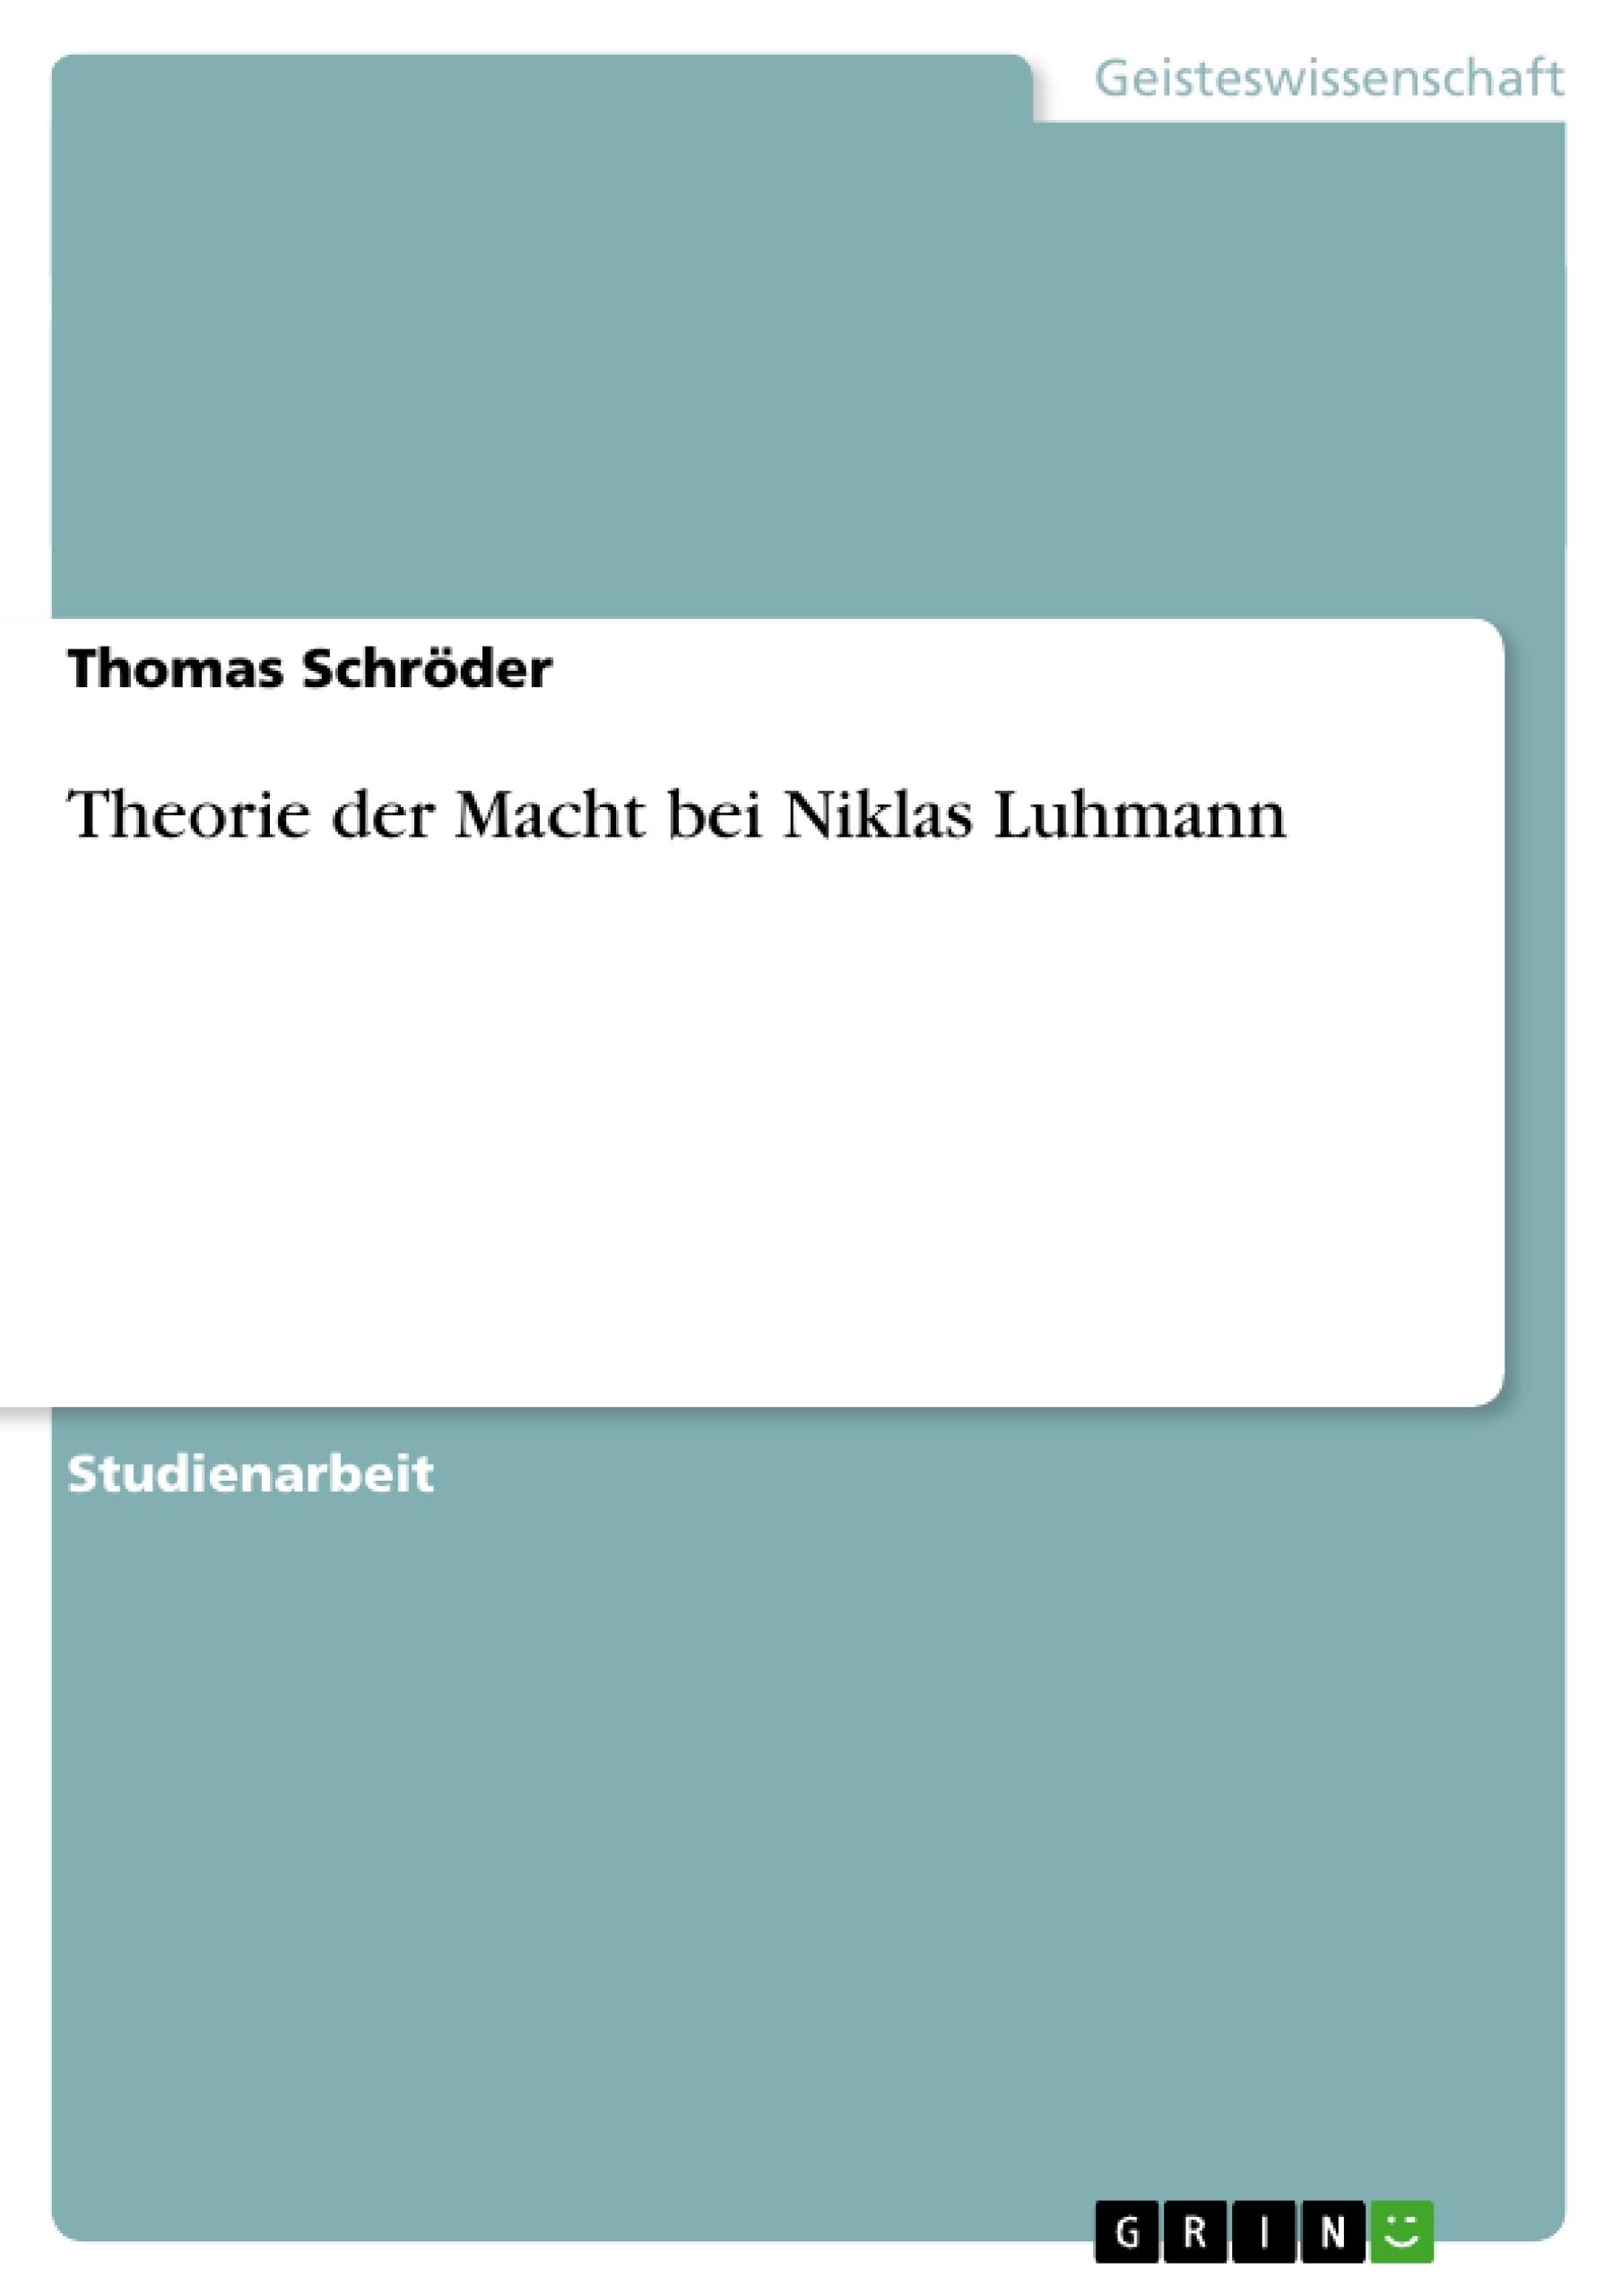 Titel: Theorie der Macht bei Niklas Luhmann